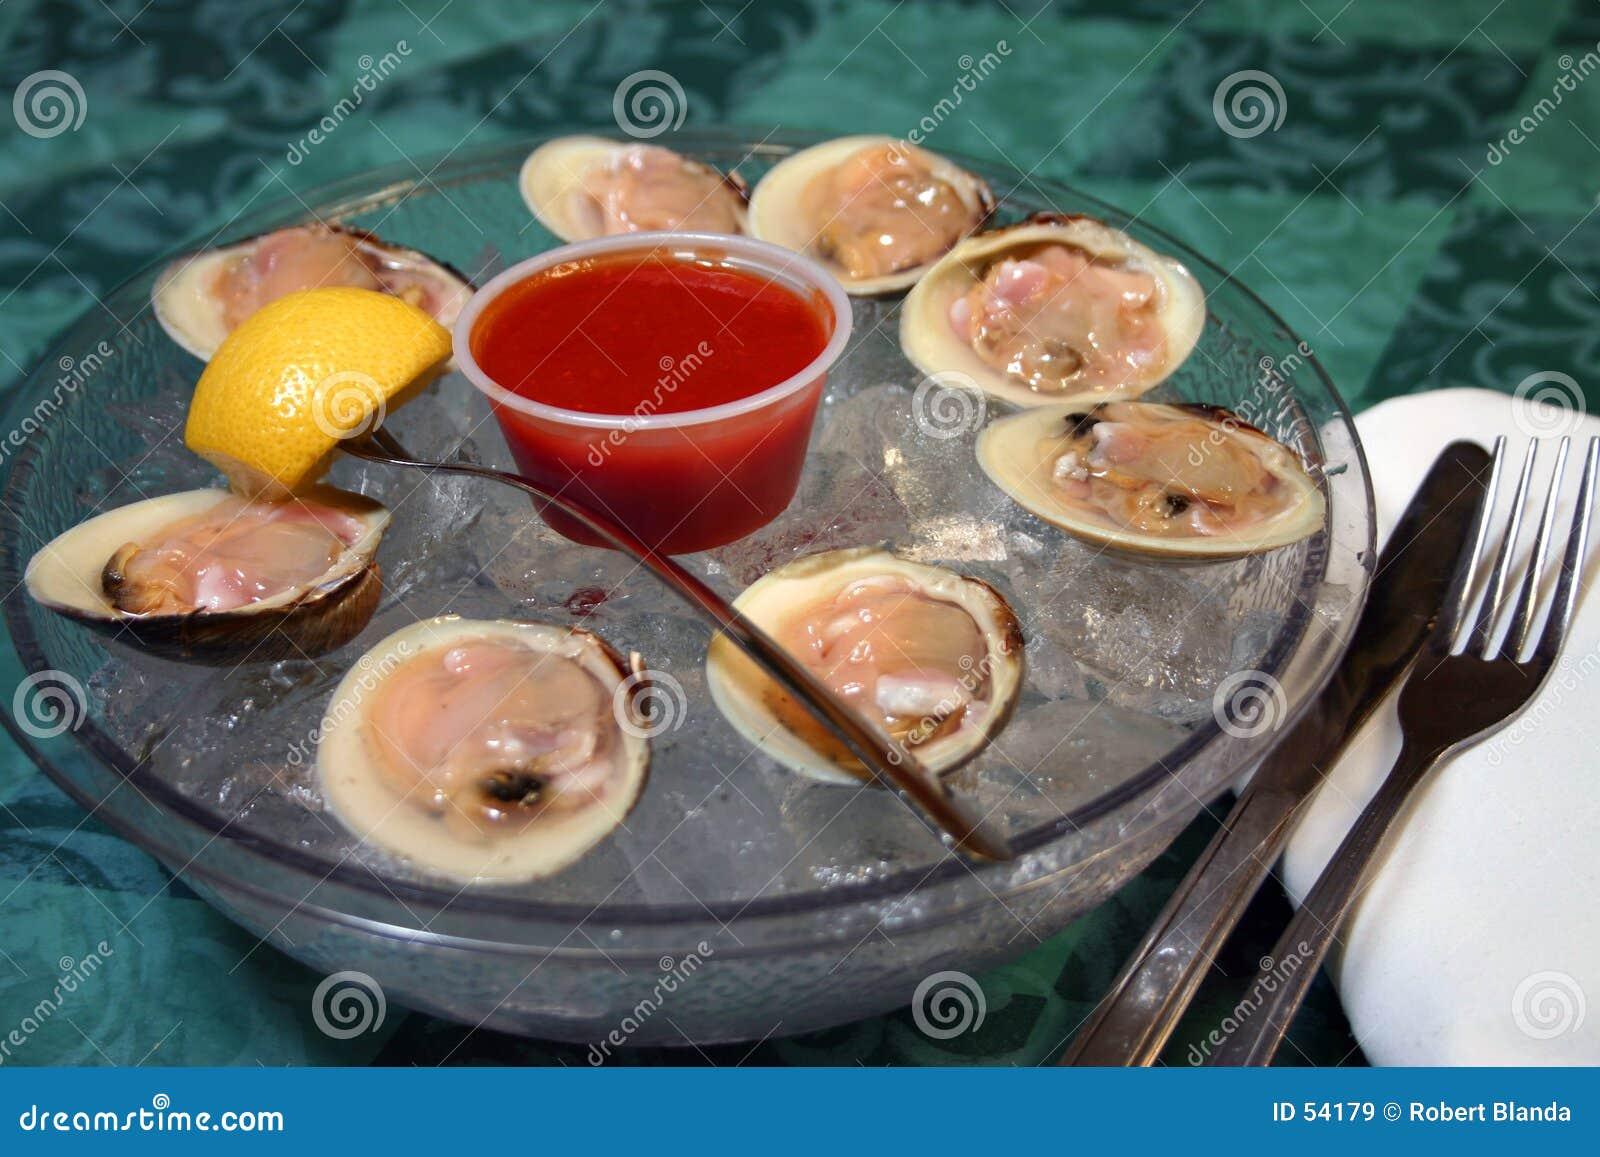 Raw clams dish